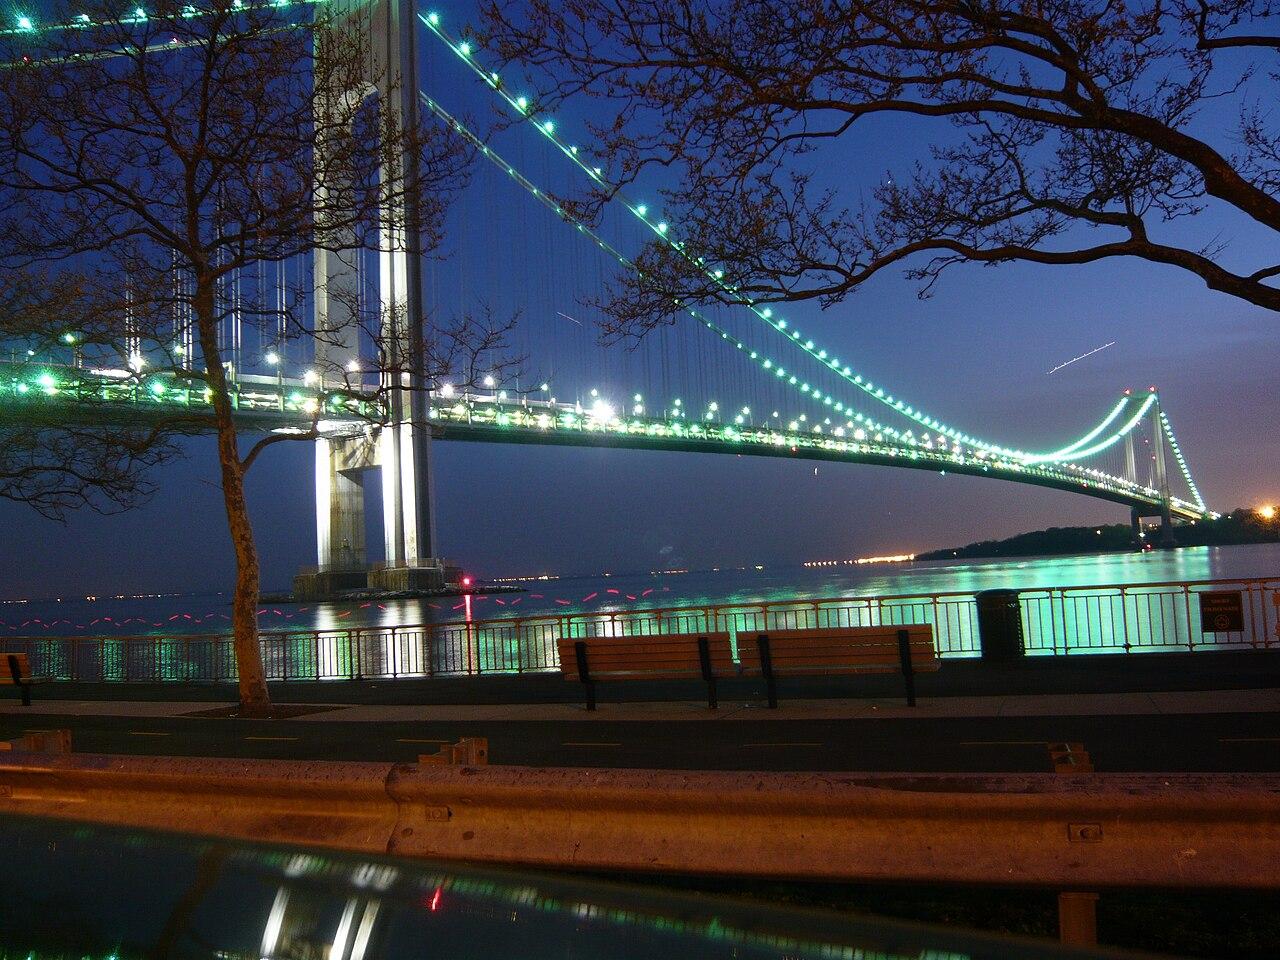 File:Verrazano Narrows Bridge.JPG - Wikimedia Commons